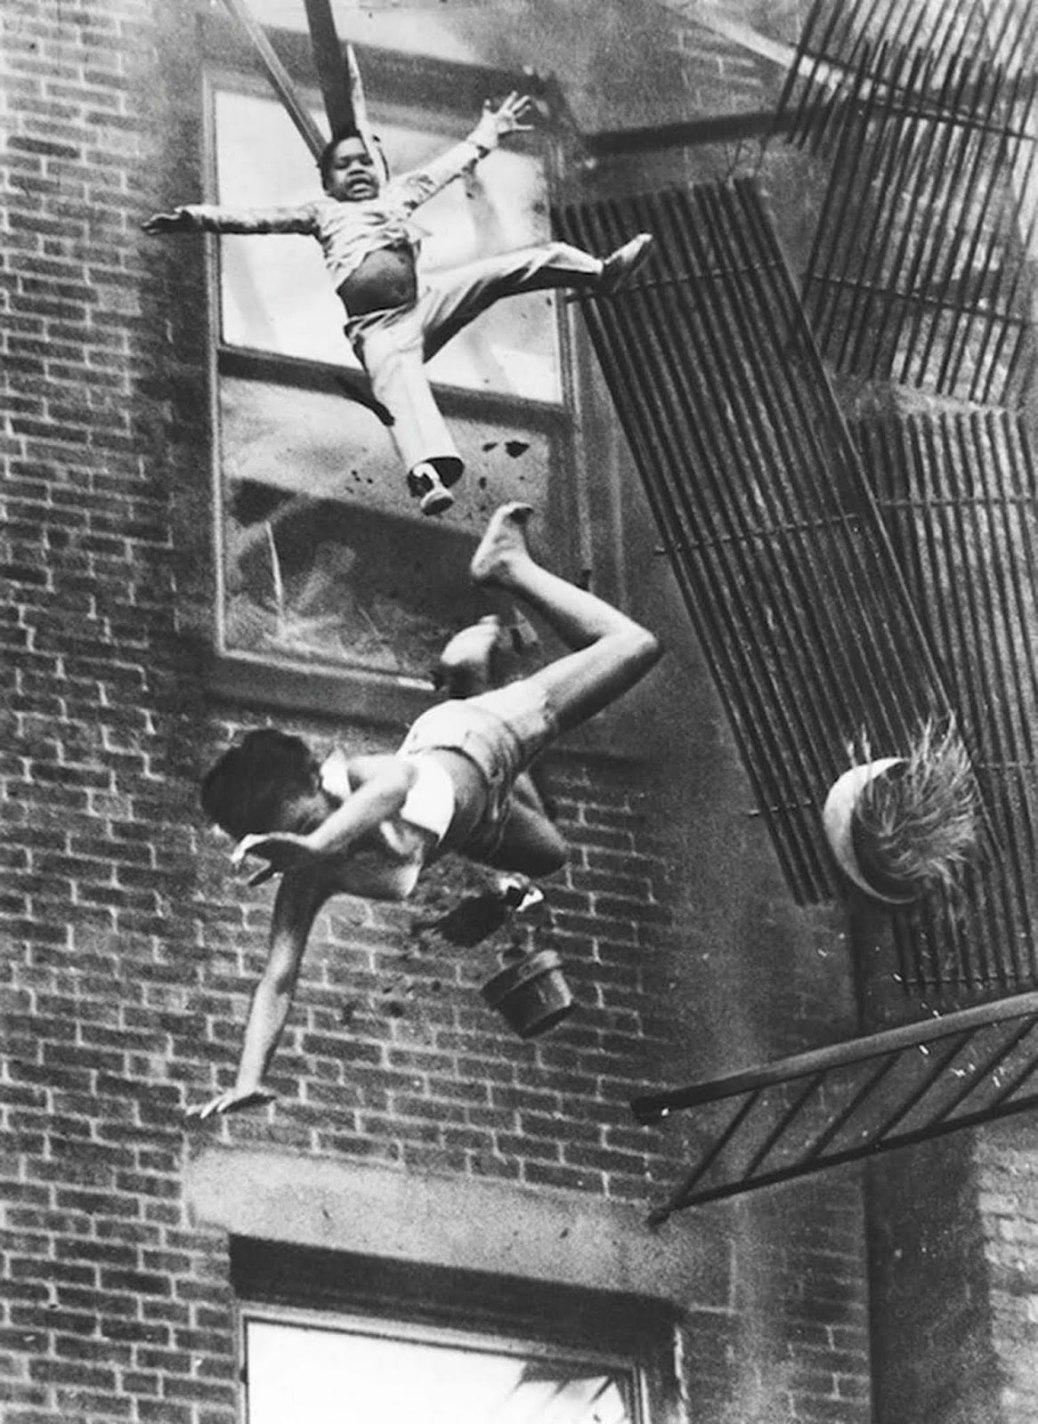 Fire Escape Collapse, Stanley Forman, 1975